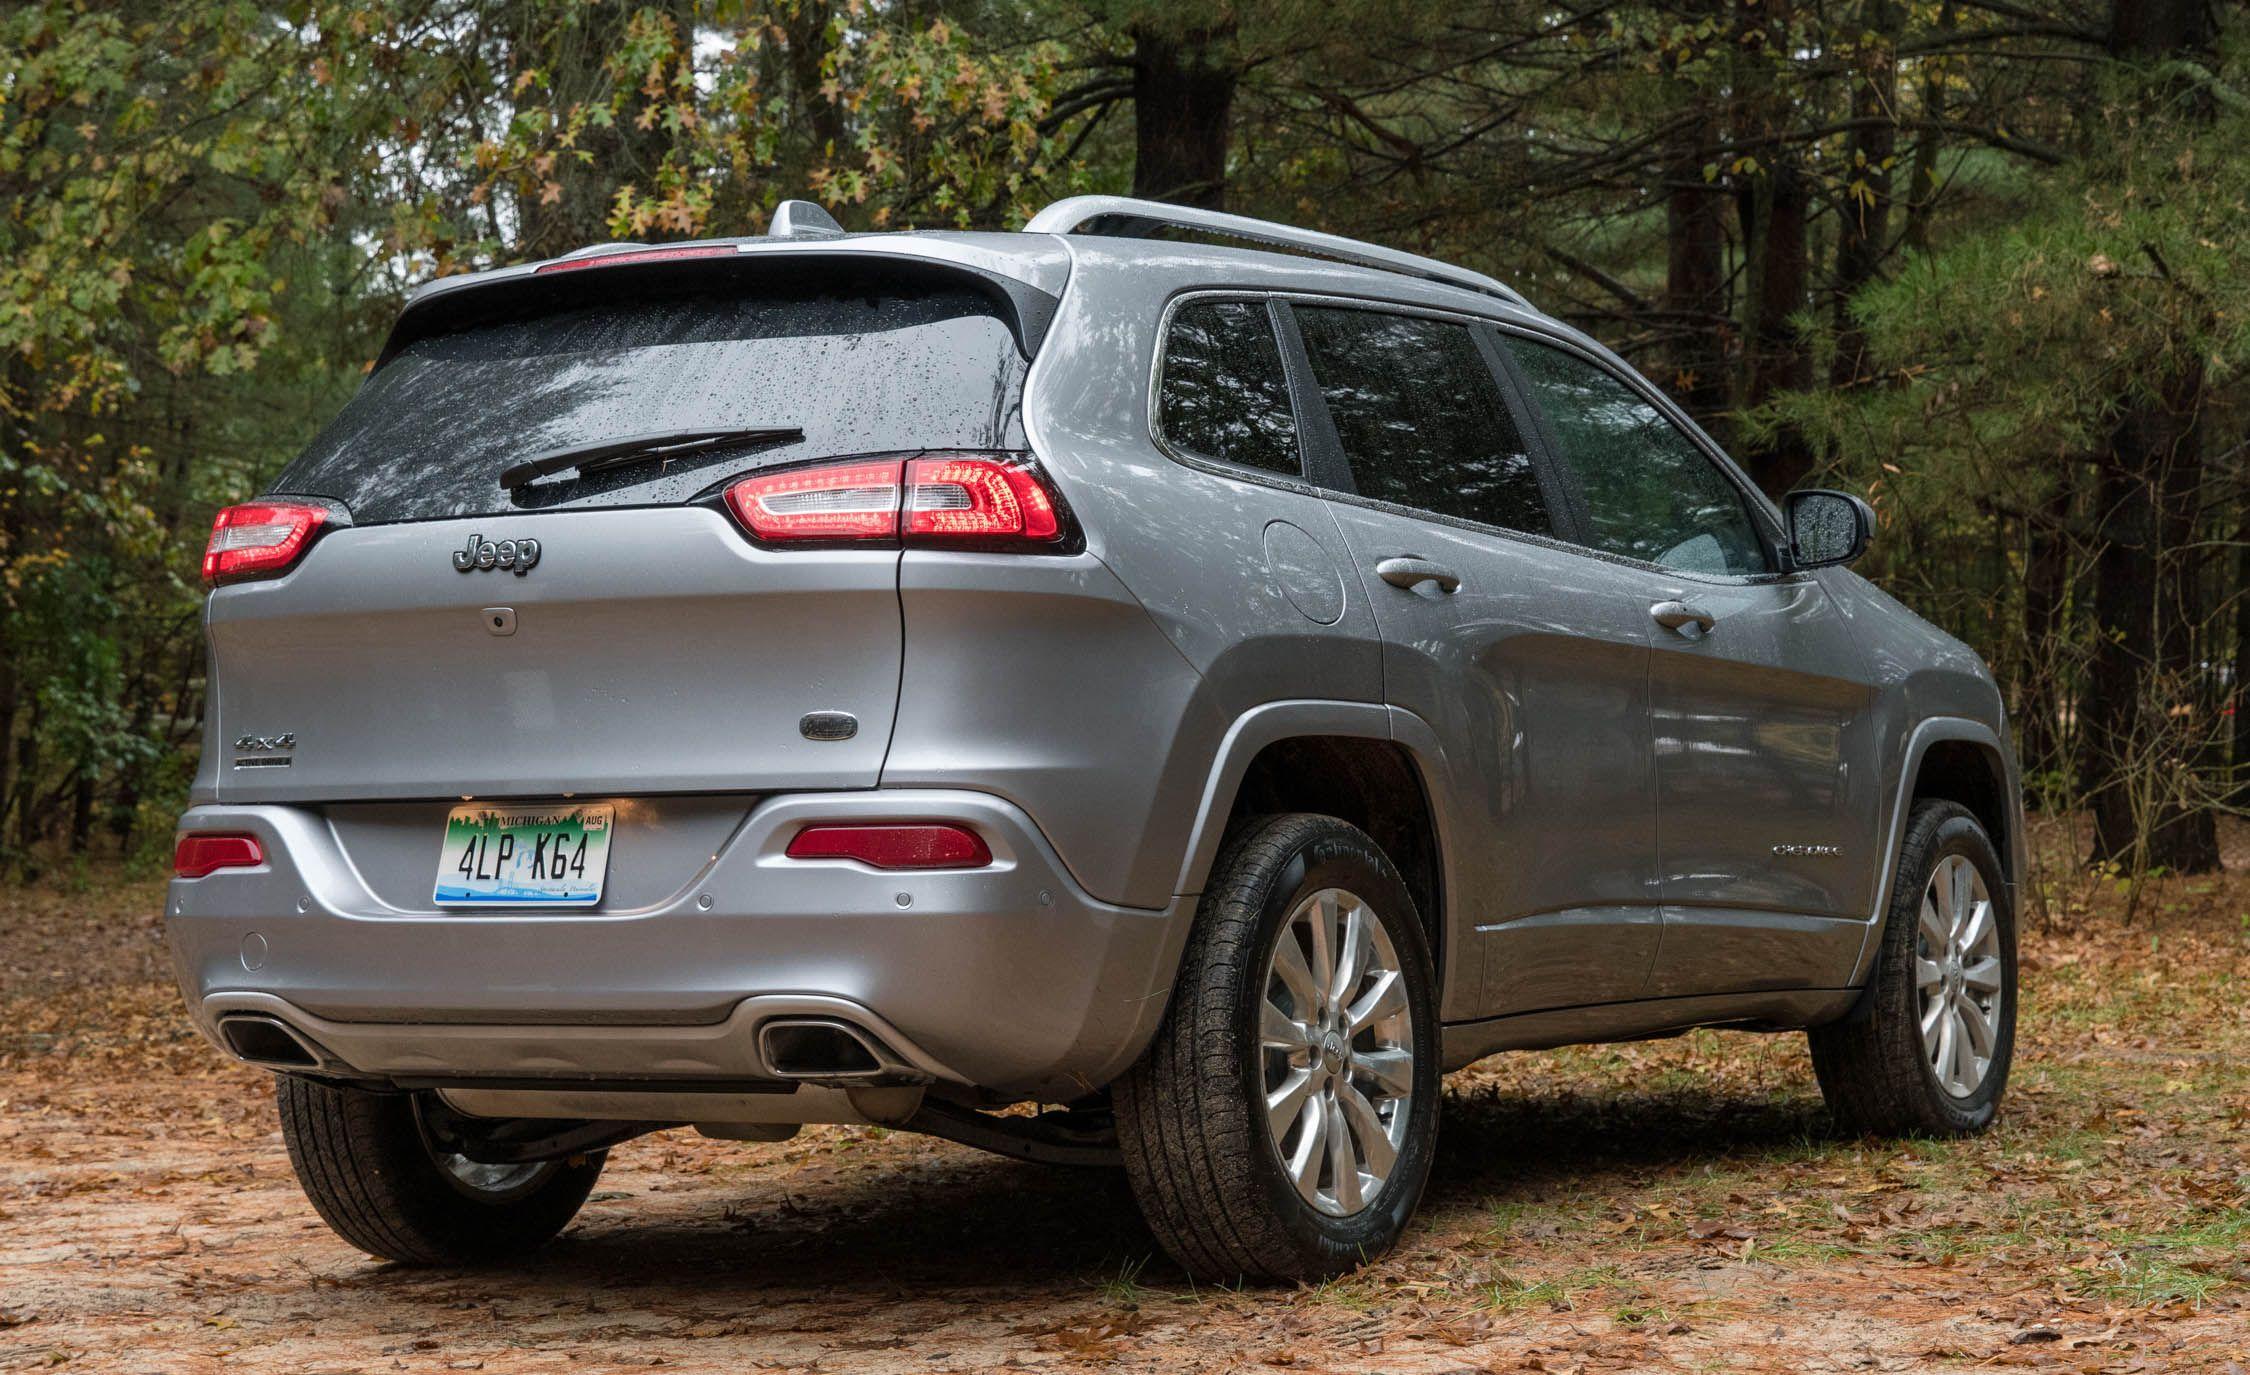 jeep cherokee reviews | jeep cherokee price, photos, and specs